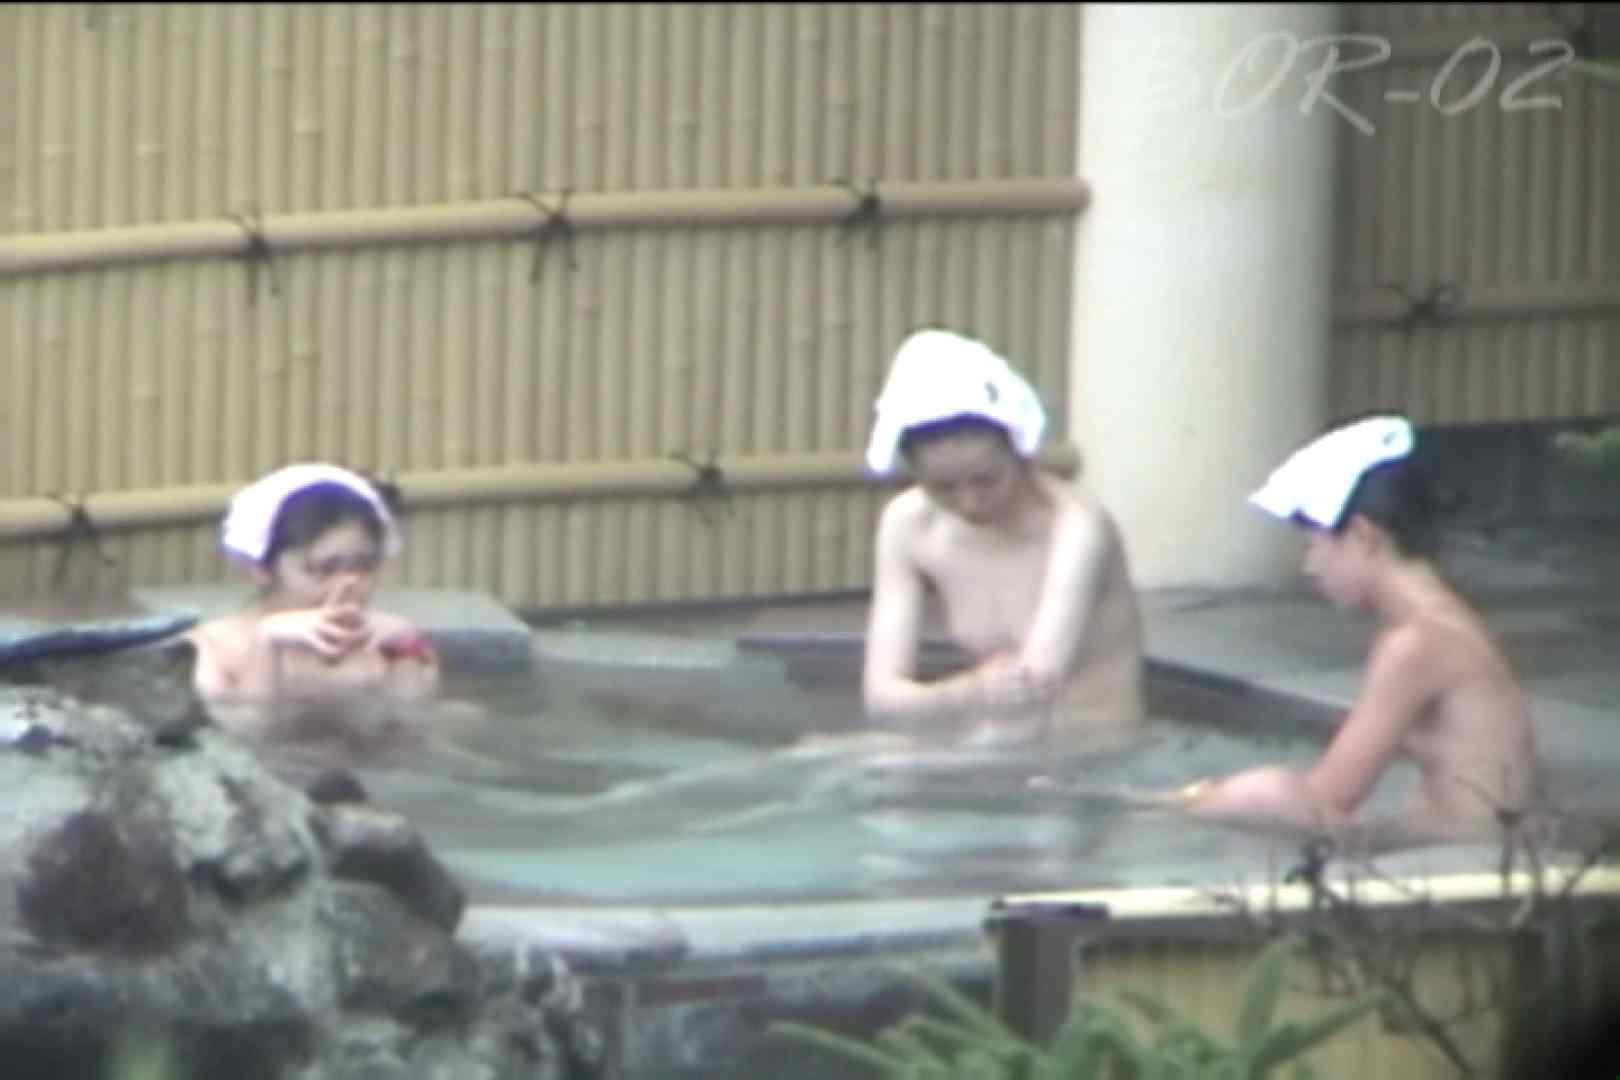 Aquaな露天風呂Vol.475 露天 | OLセックス  96画像 64